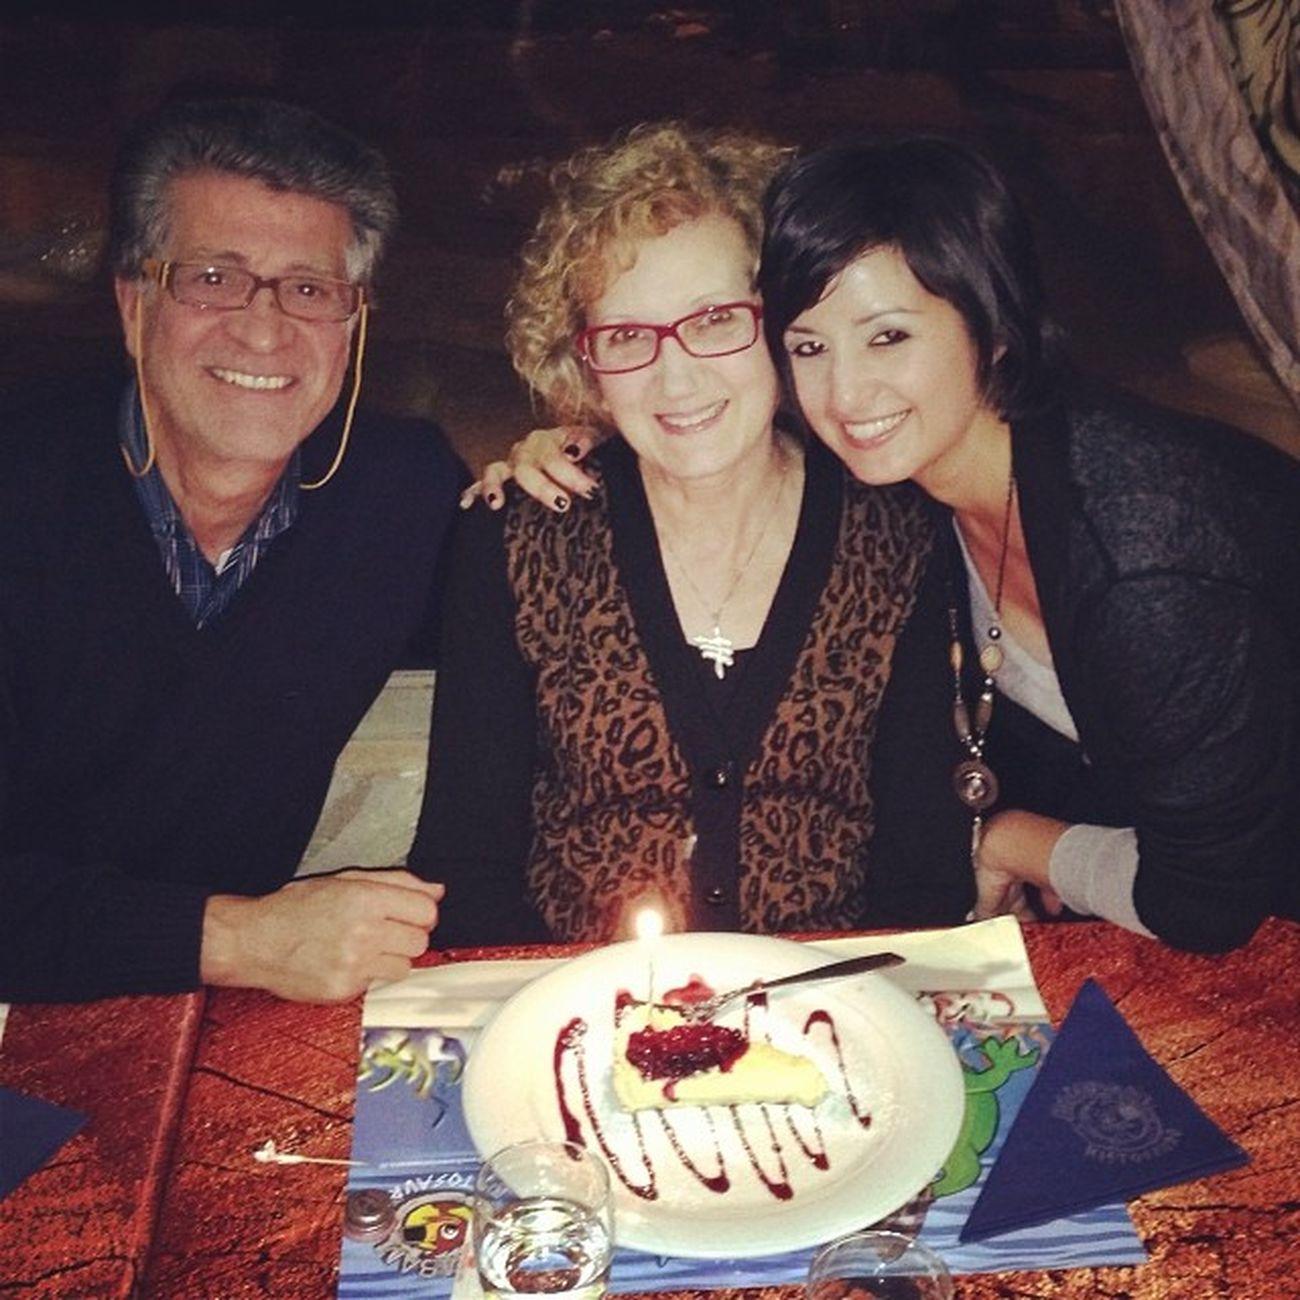 Familydinner Birthdaydinner MommyLove Mommysbirthday 😍😍😍😘😘😘👪💗💗💗💐💐💐🎉🎉🎉🎉🎁🎁🎁🎵🎵🎵🍷🍴🎂🎂🎂🎂🍰🍰🍰